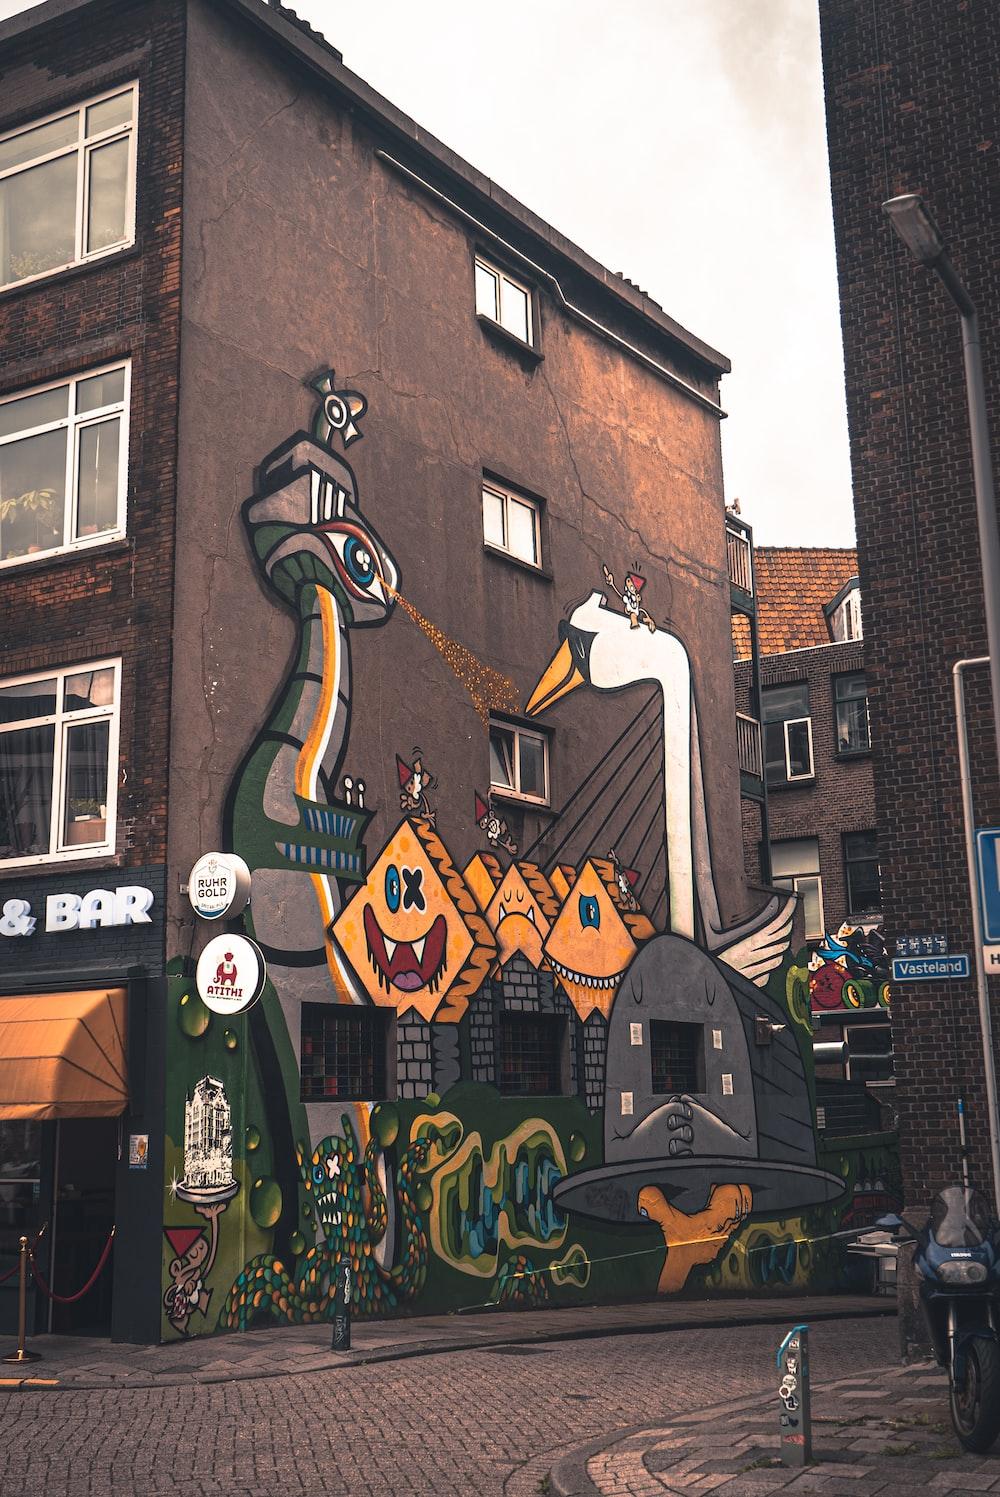 brown and gray graffiti